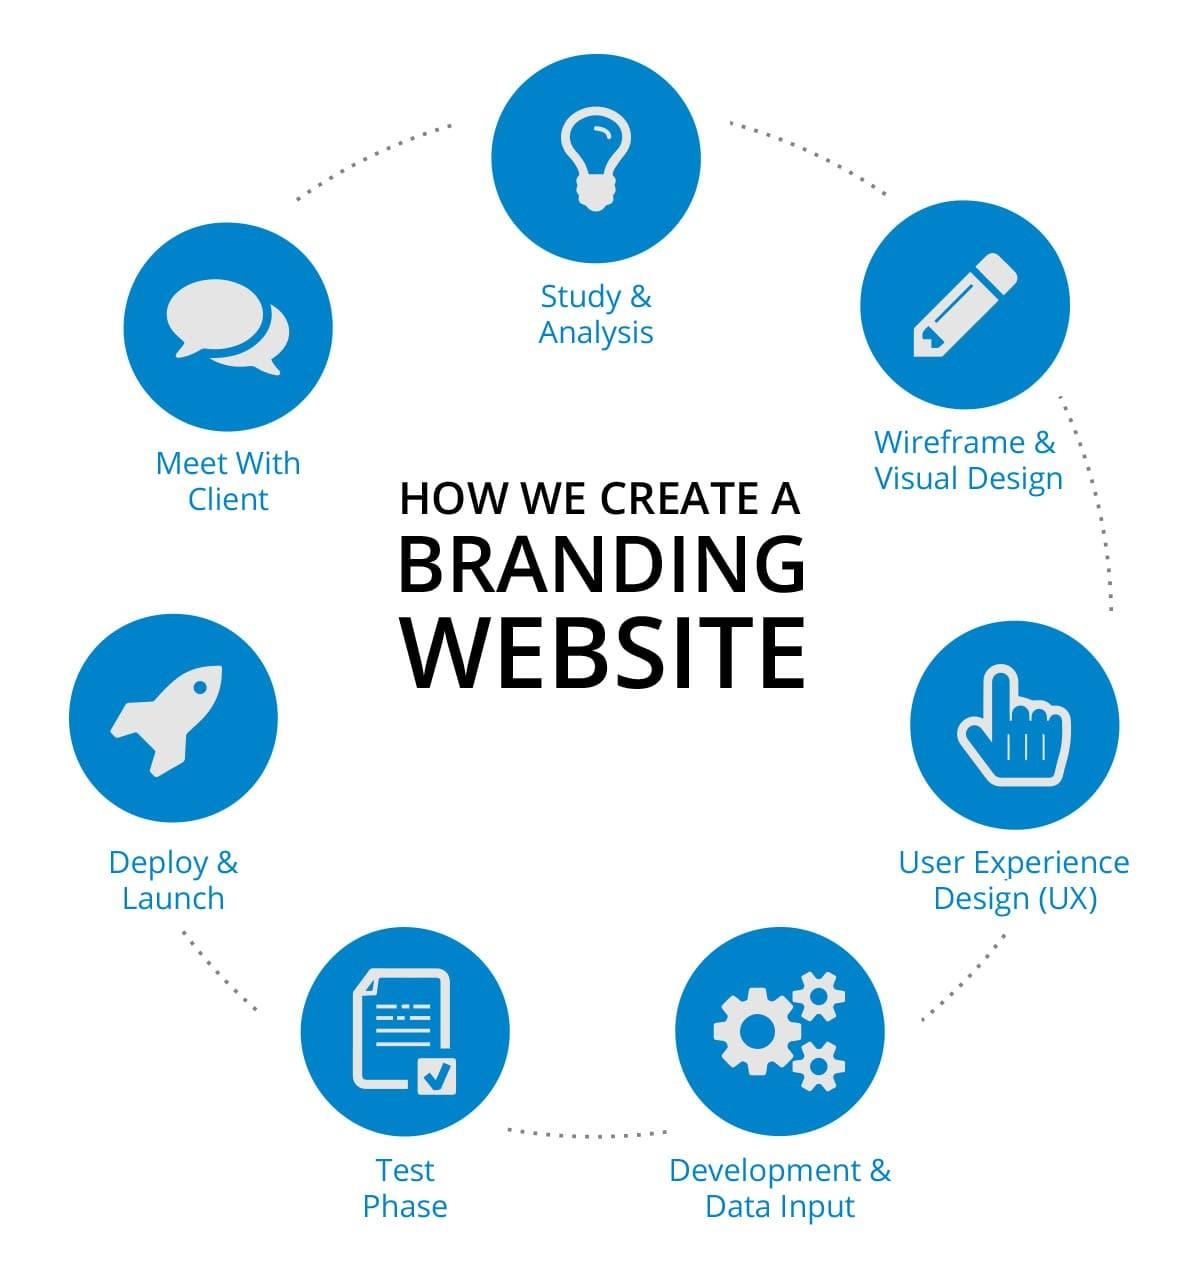 MichaelSoft - Reponsive Web Design